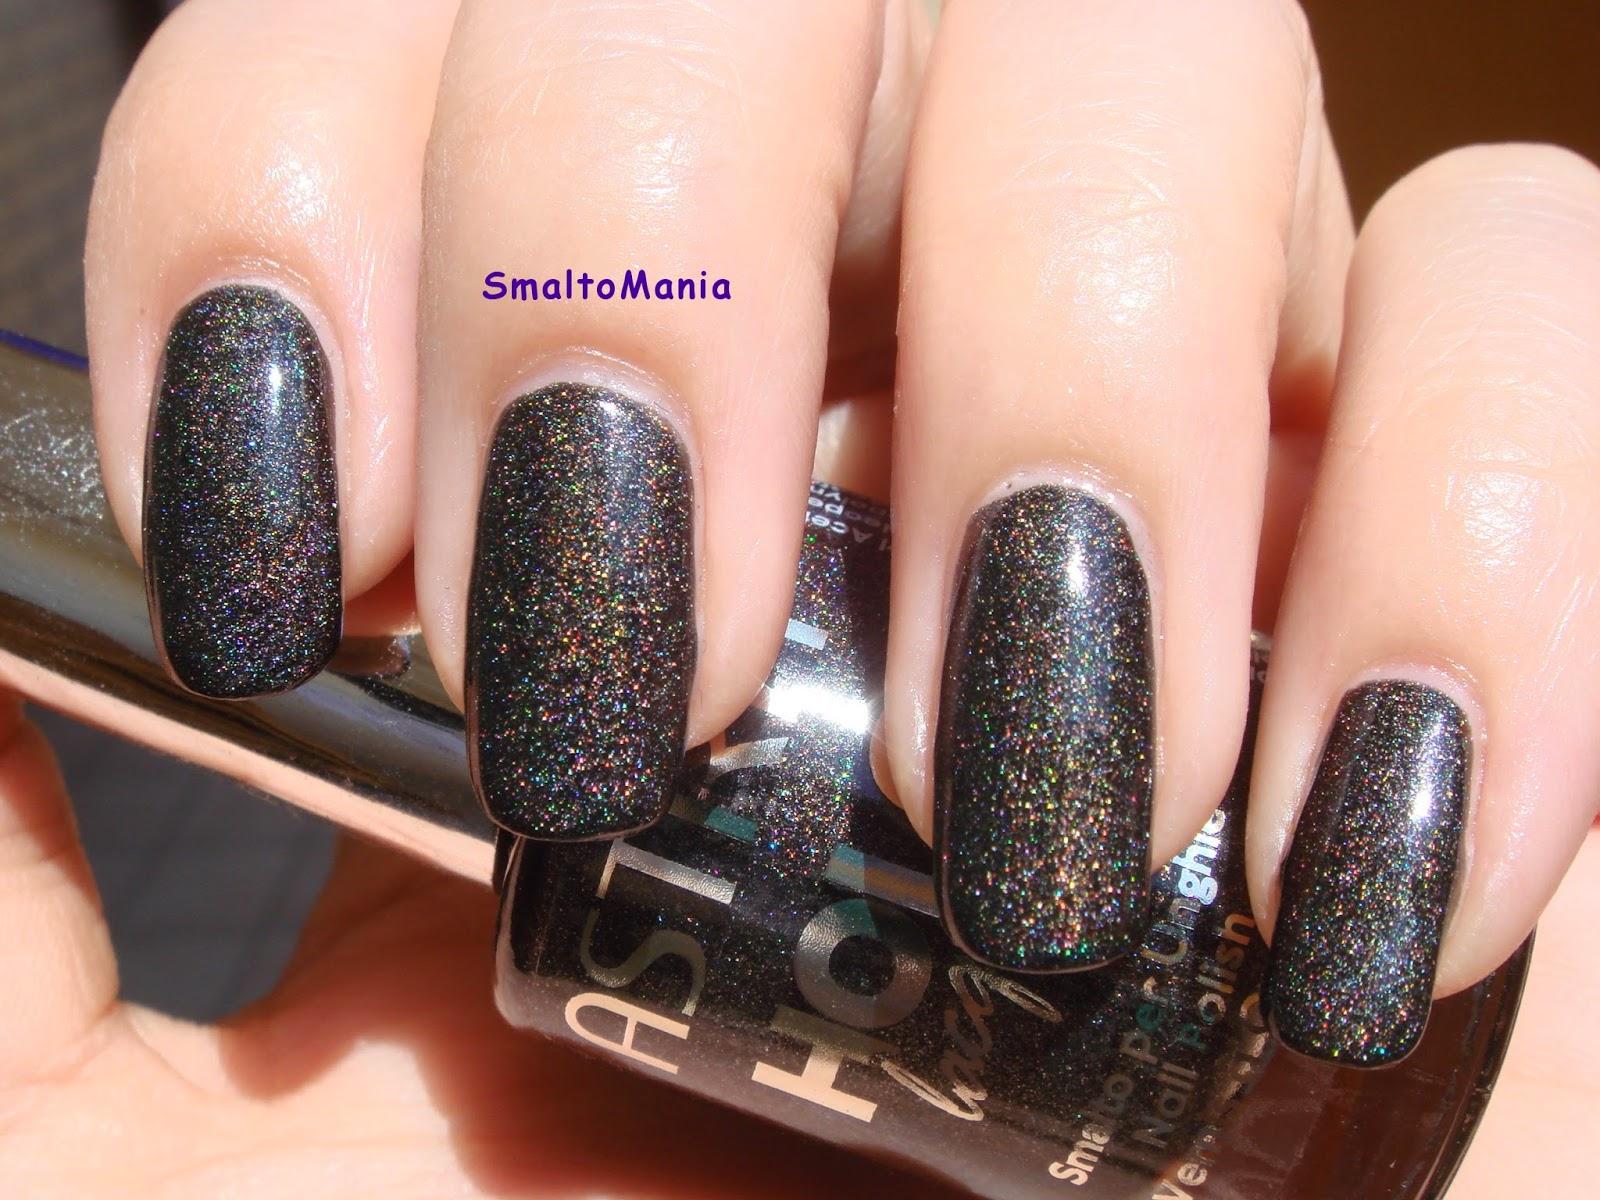 Astra n.701 Holo Black